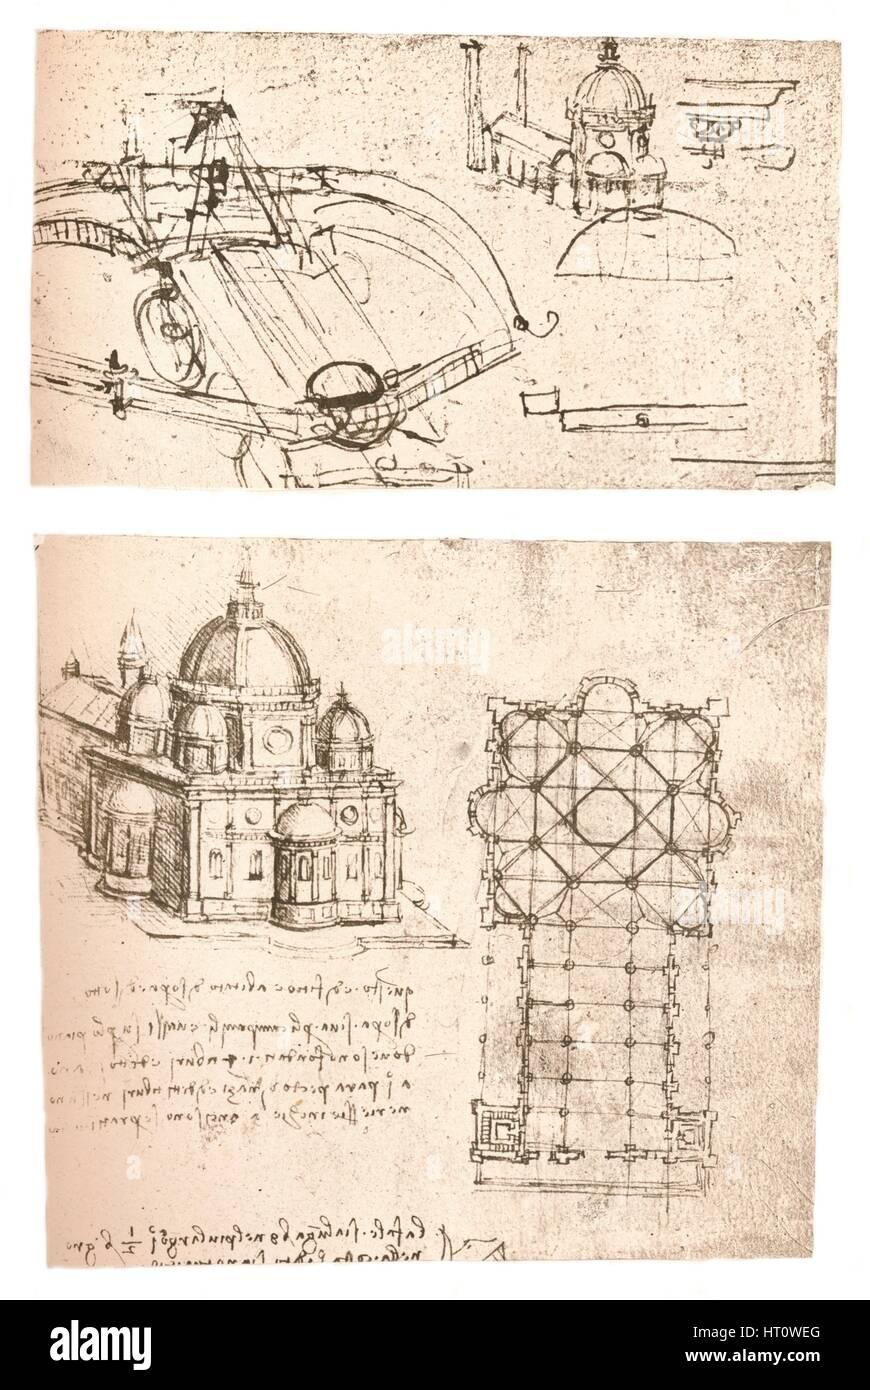 Two drawings of churches, c1472-c1519 (1883). Artist: Leonardo da Vinci. - Stock Image